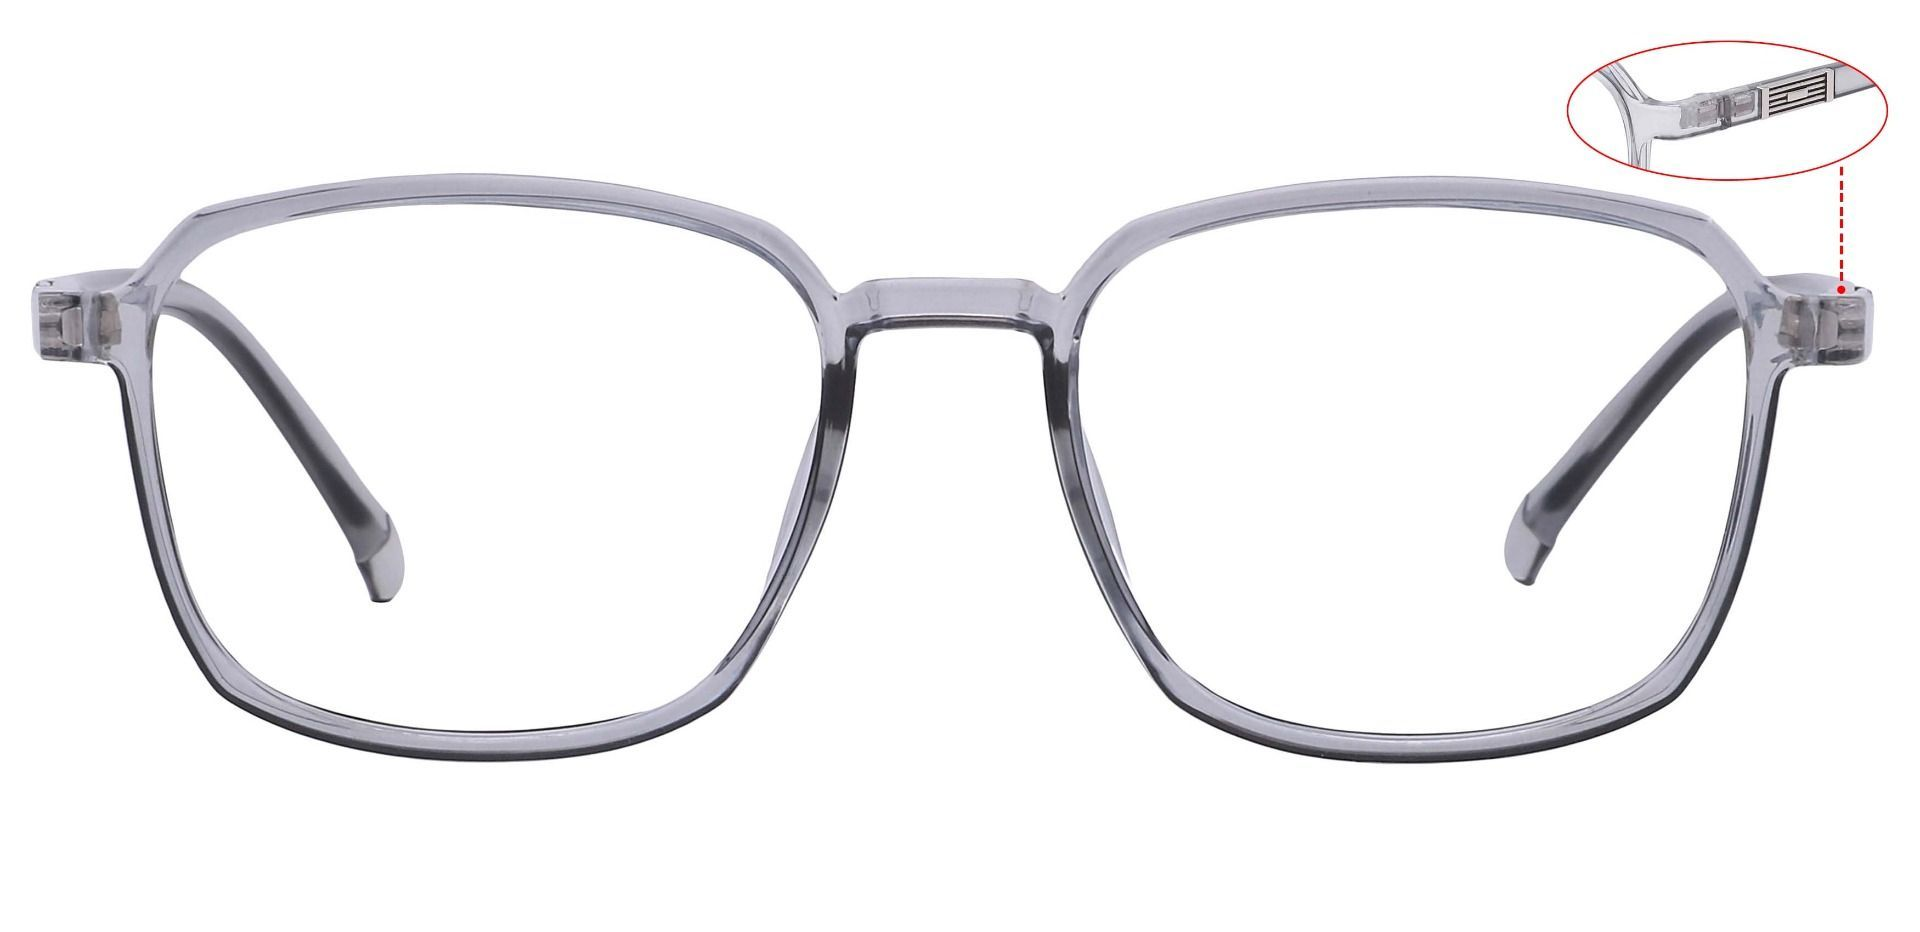 Stella Square Progressive Glasses - Gray